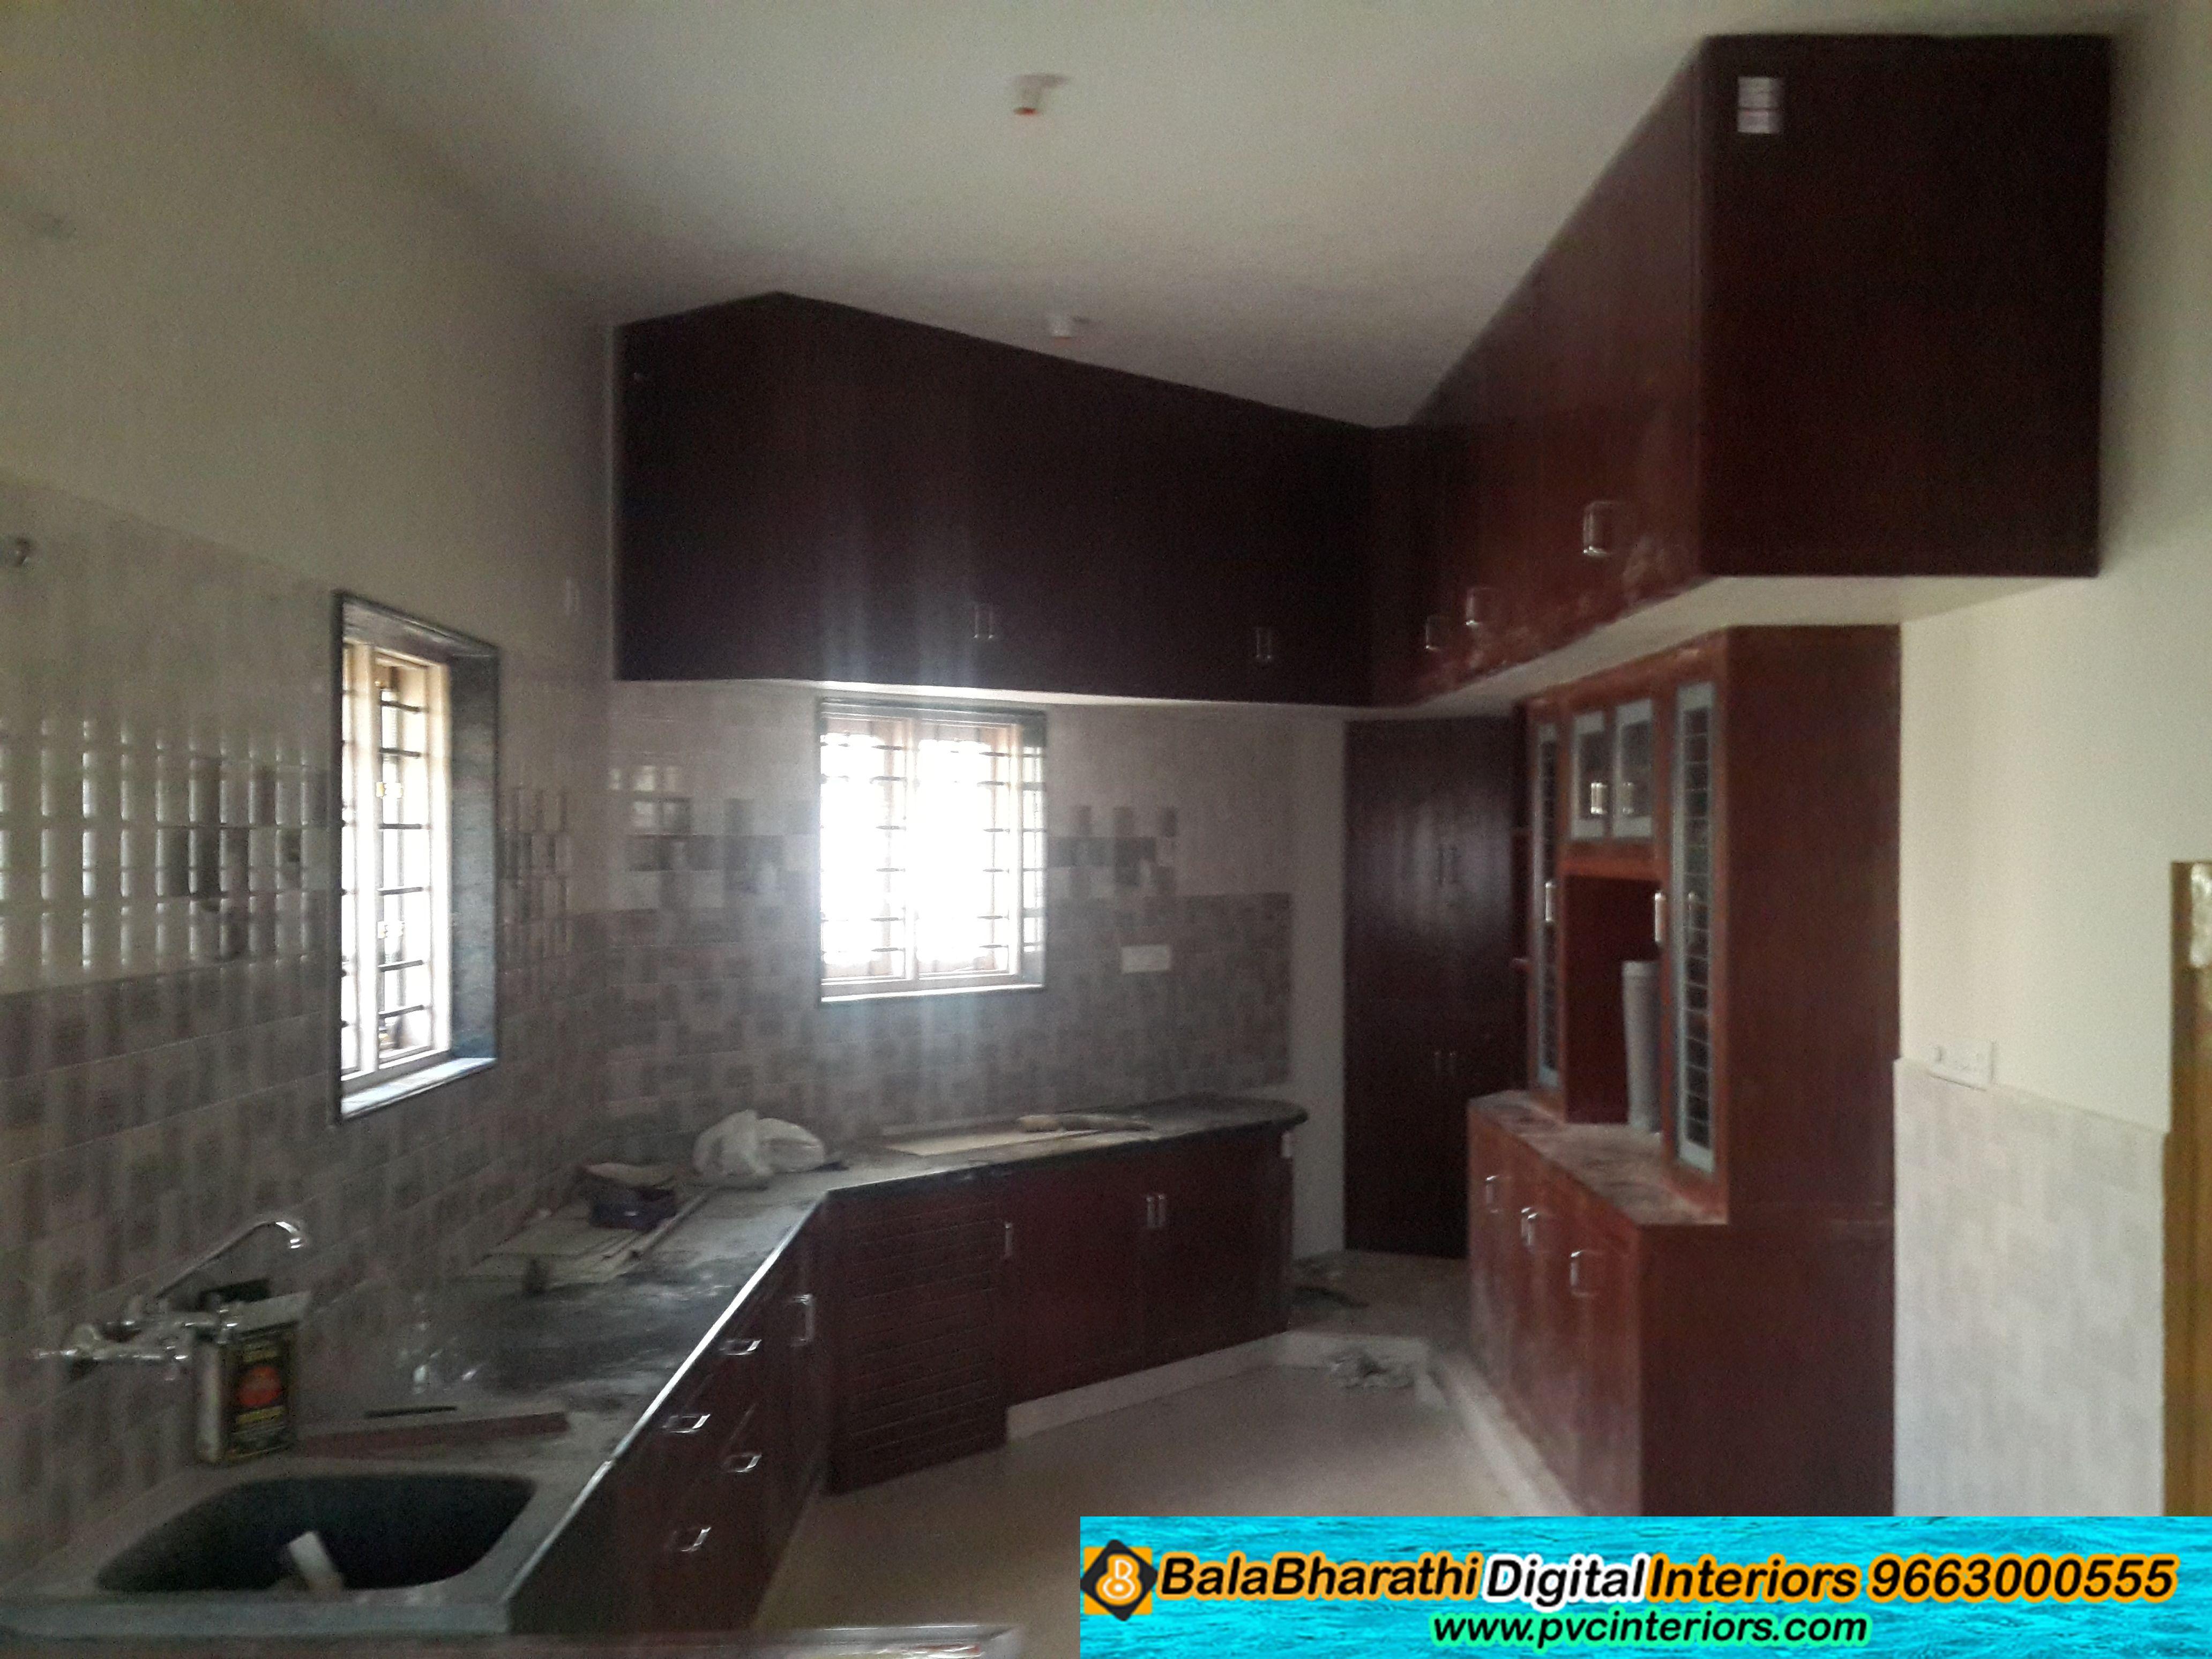 Pvc Modular Kitchen Pvc Kitchen Cabinets Pvc Wardrobes Design Kitchen Furniture Design Kitchen Designs Layout Interior Design Kitchen